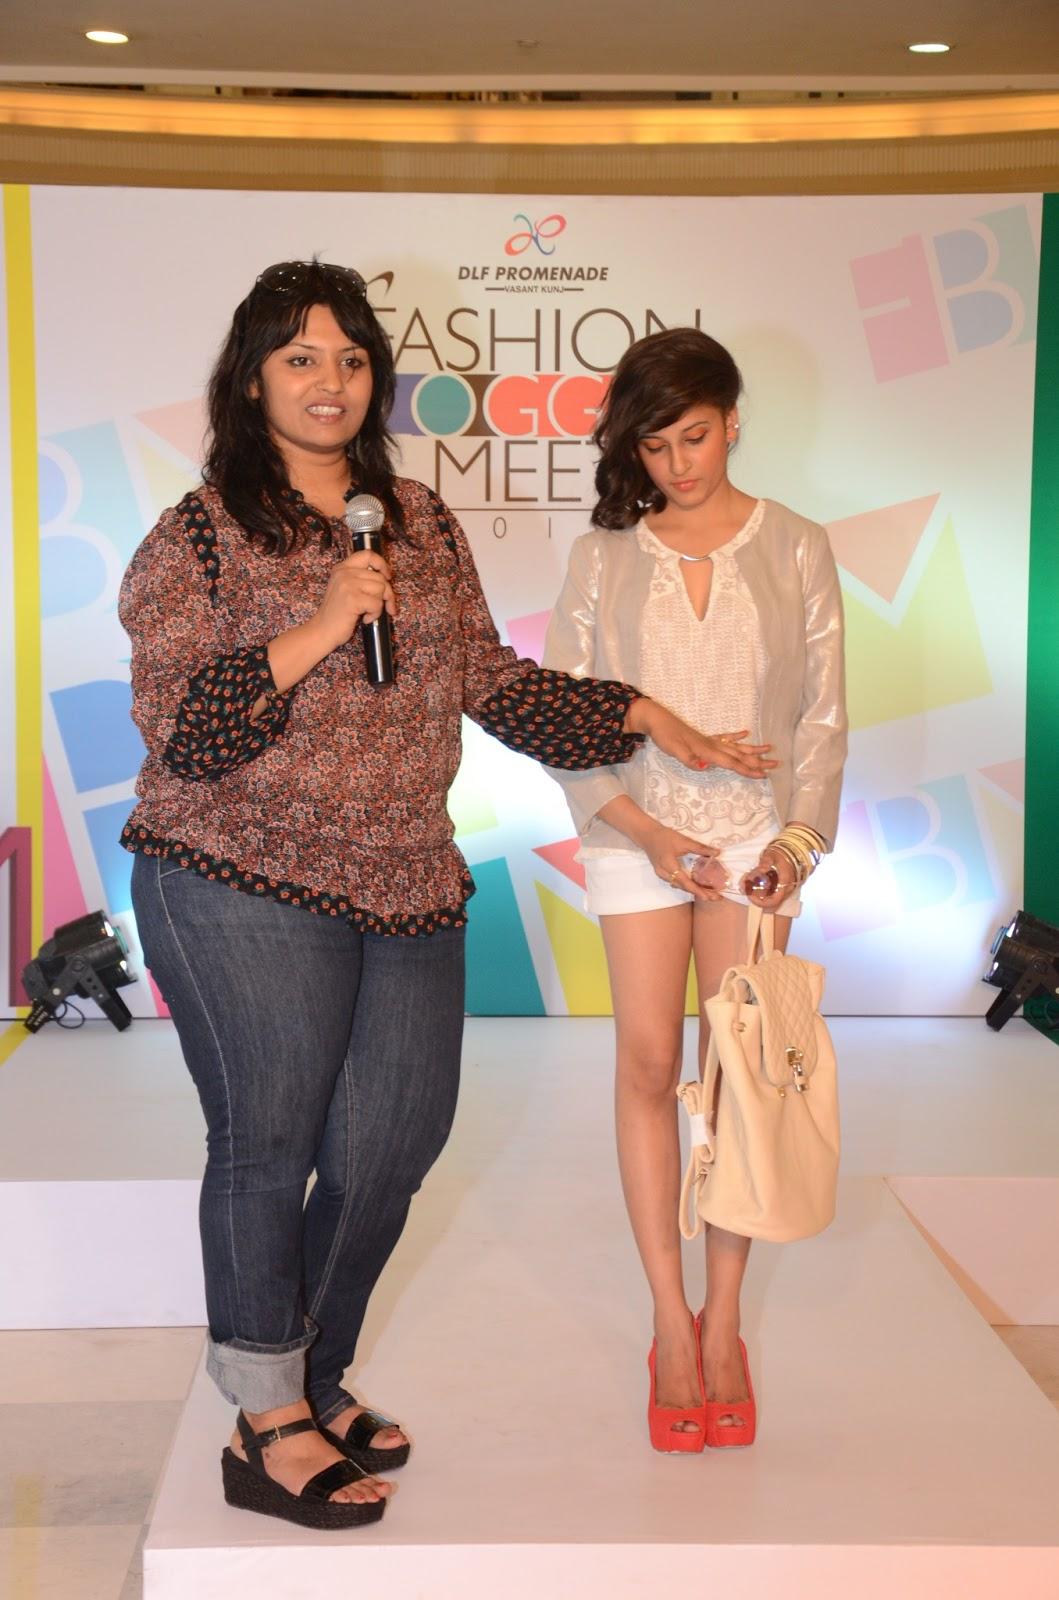 Fashion Bloggers Meet 2013 Dlf Promenade Delhi Delhi Style Blog